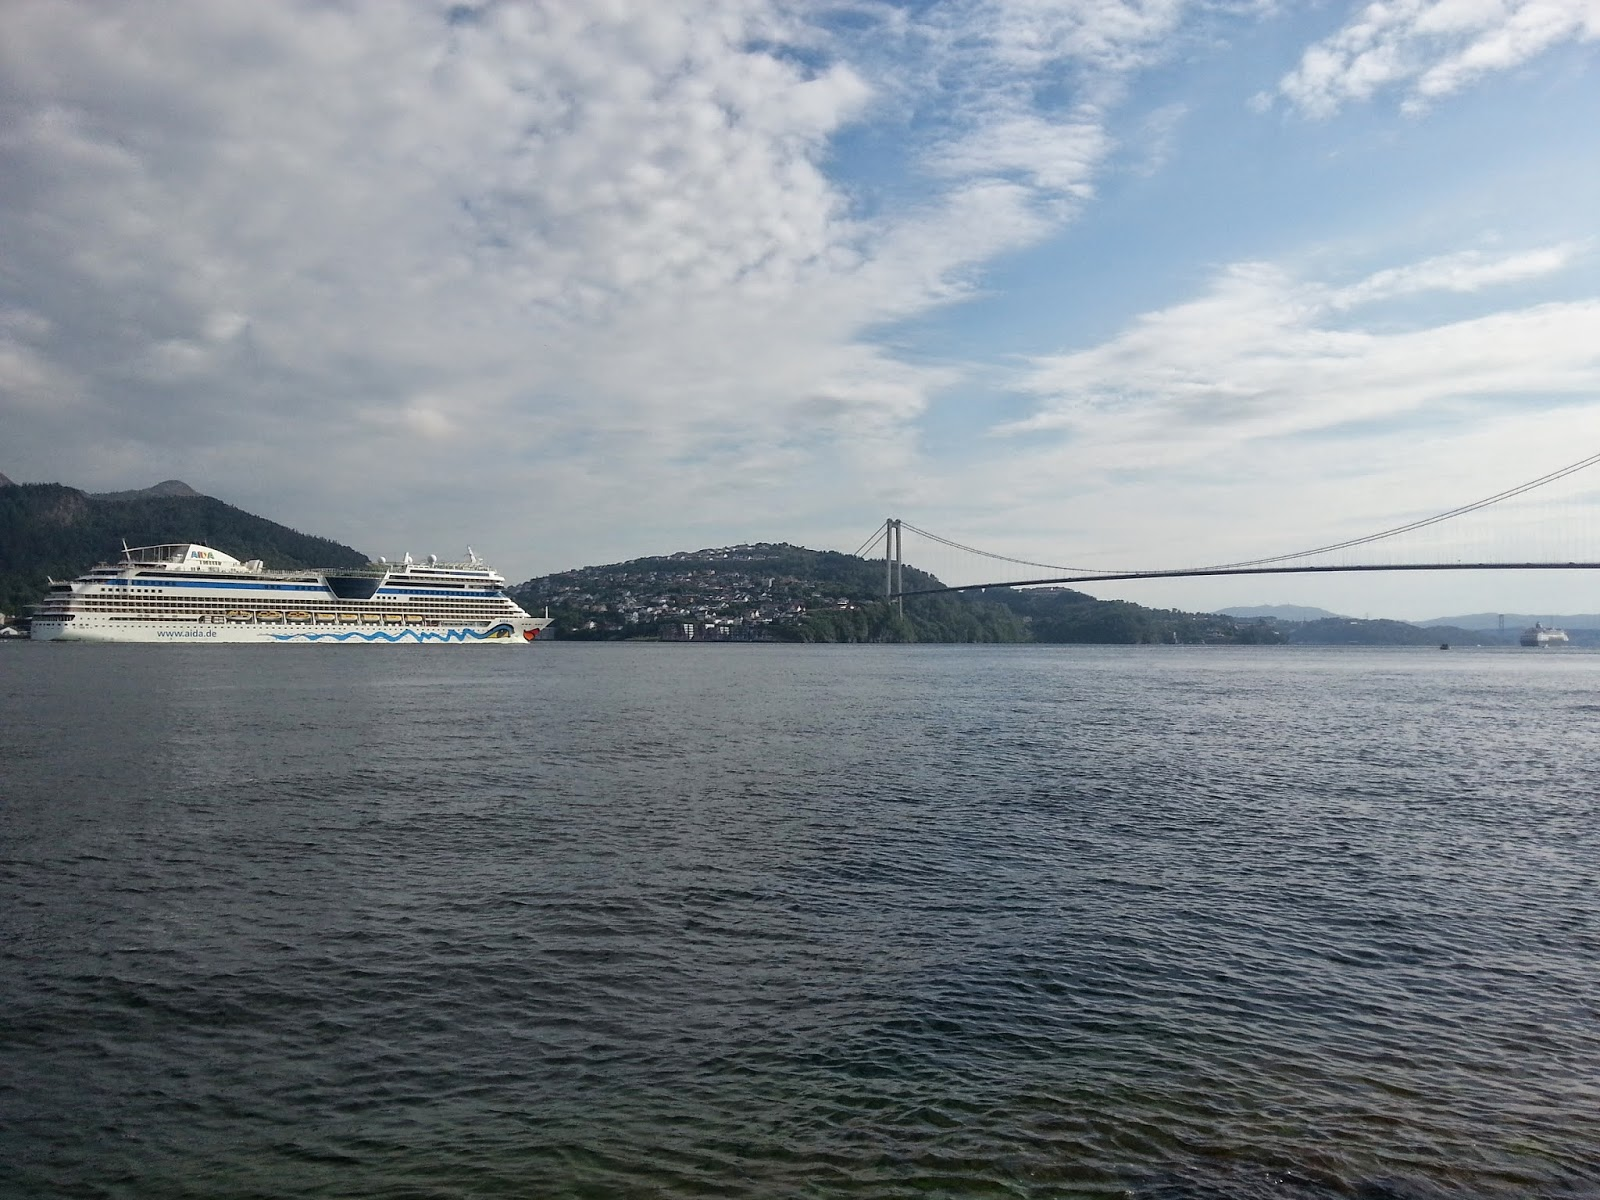 Cruise Ship AIDAsol in Bergen